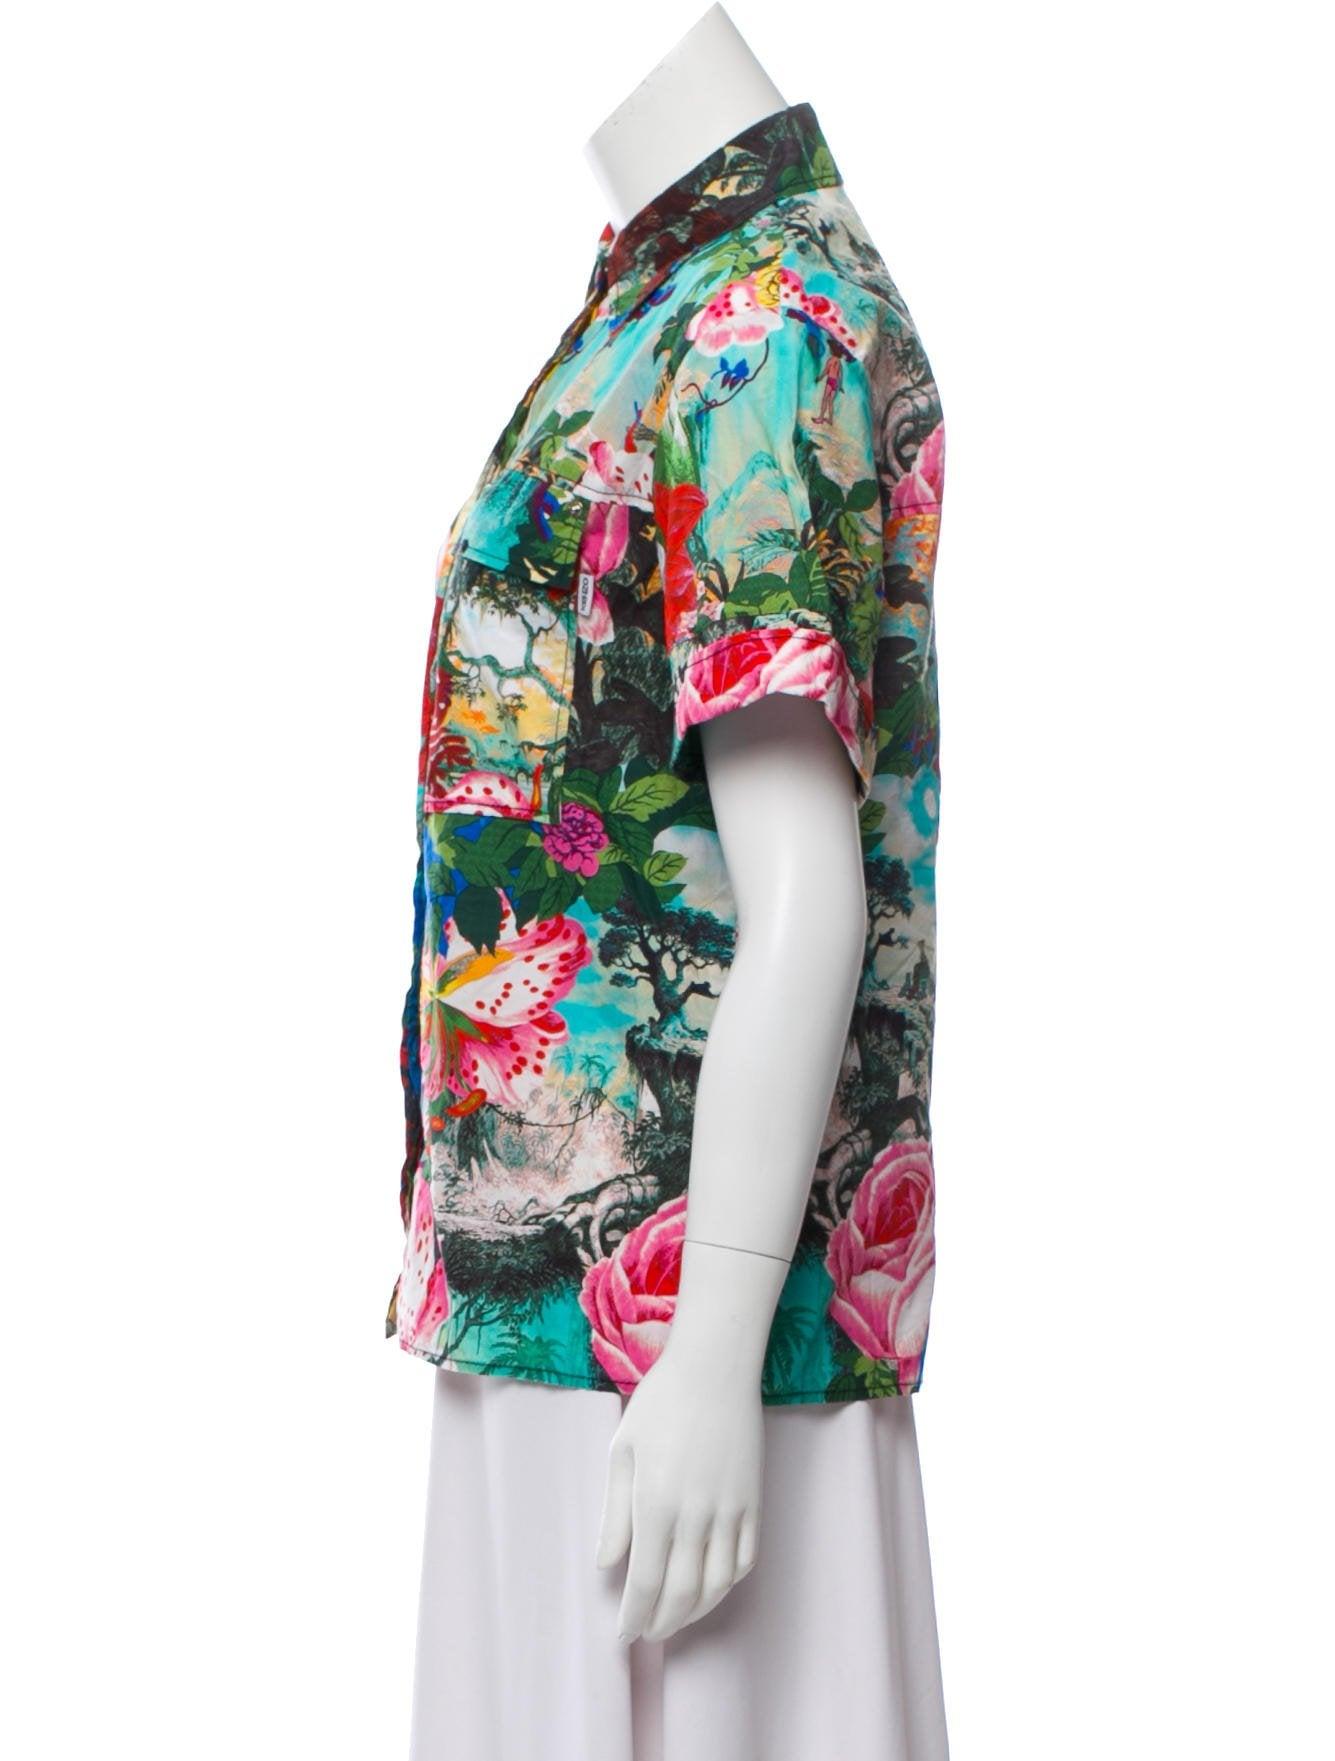 45340fb5ad7a Kenzo 2016 Jungle Book Printed Top - Clothing - KEN28879